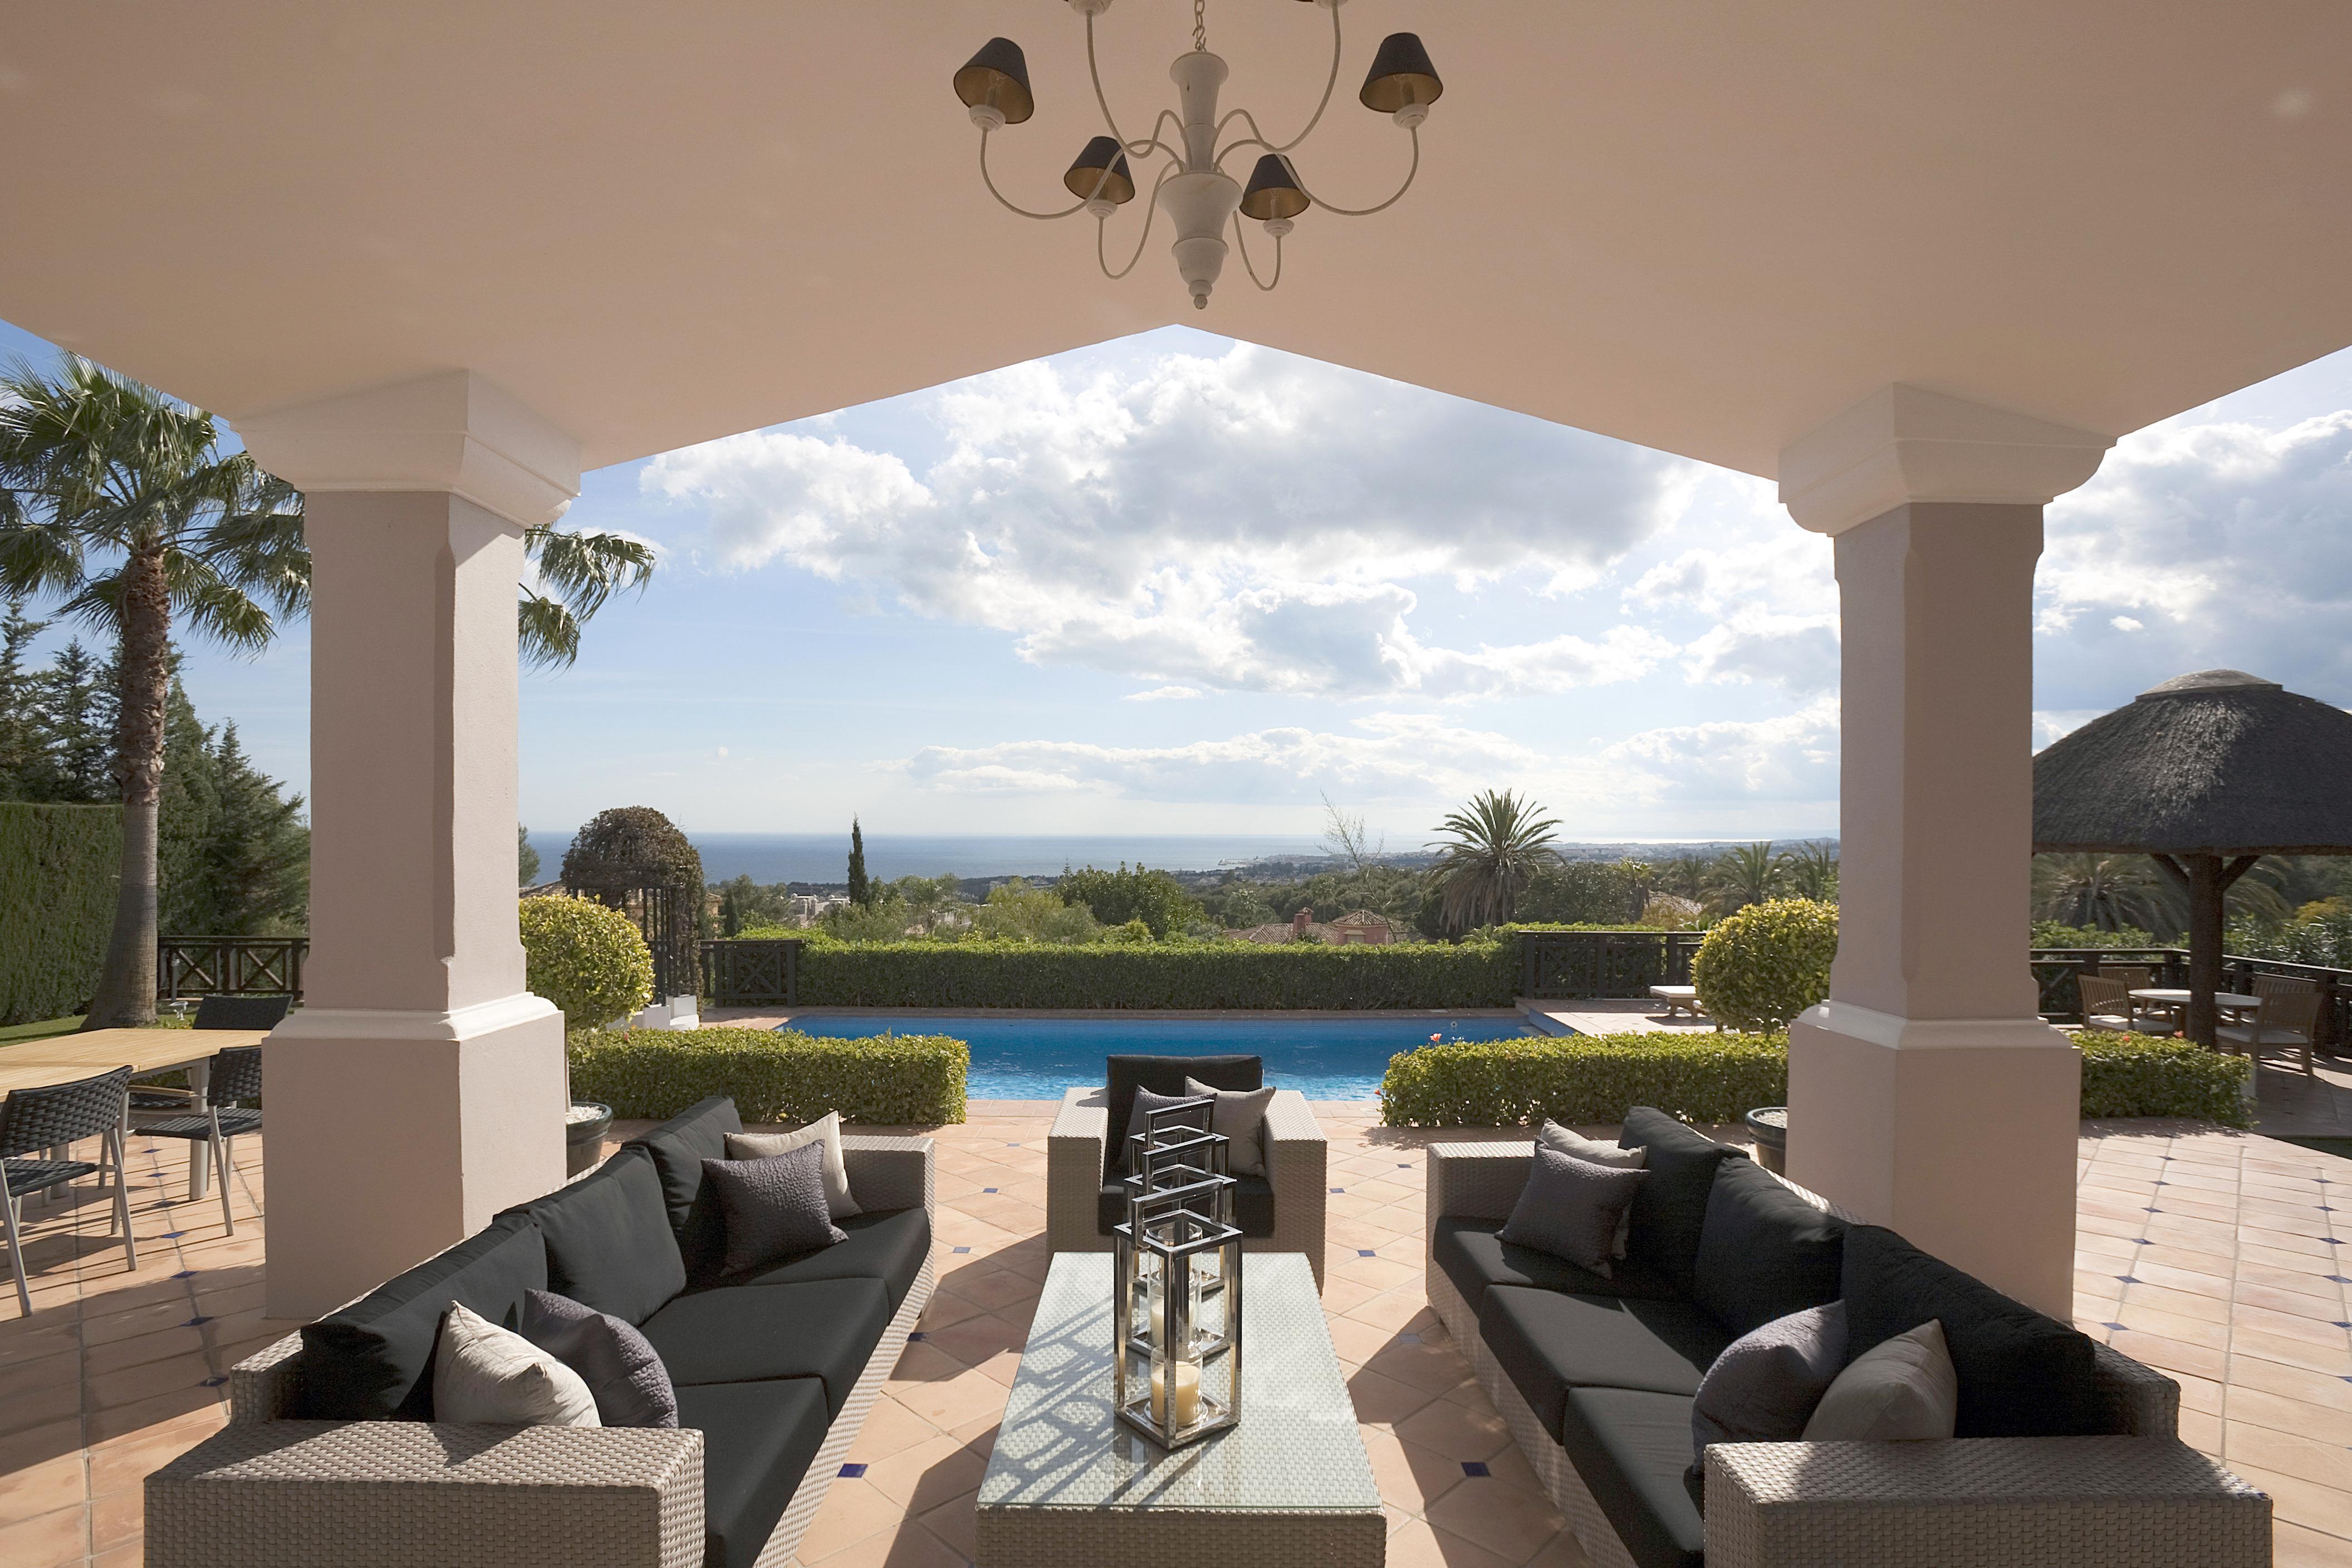 Villas in Sierra Blanca: Marbella's most sought-after address